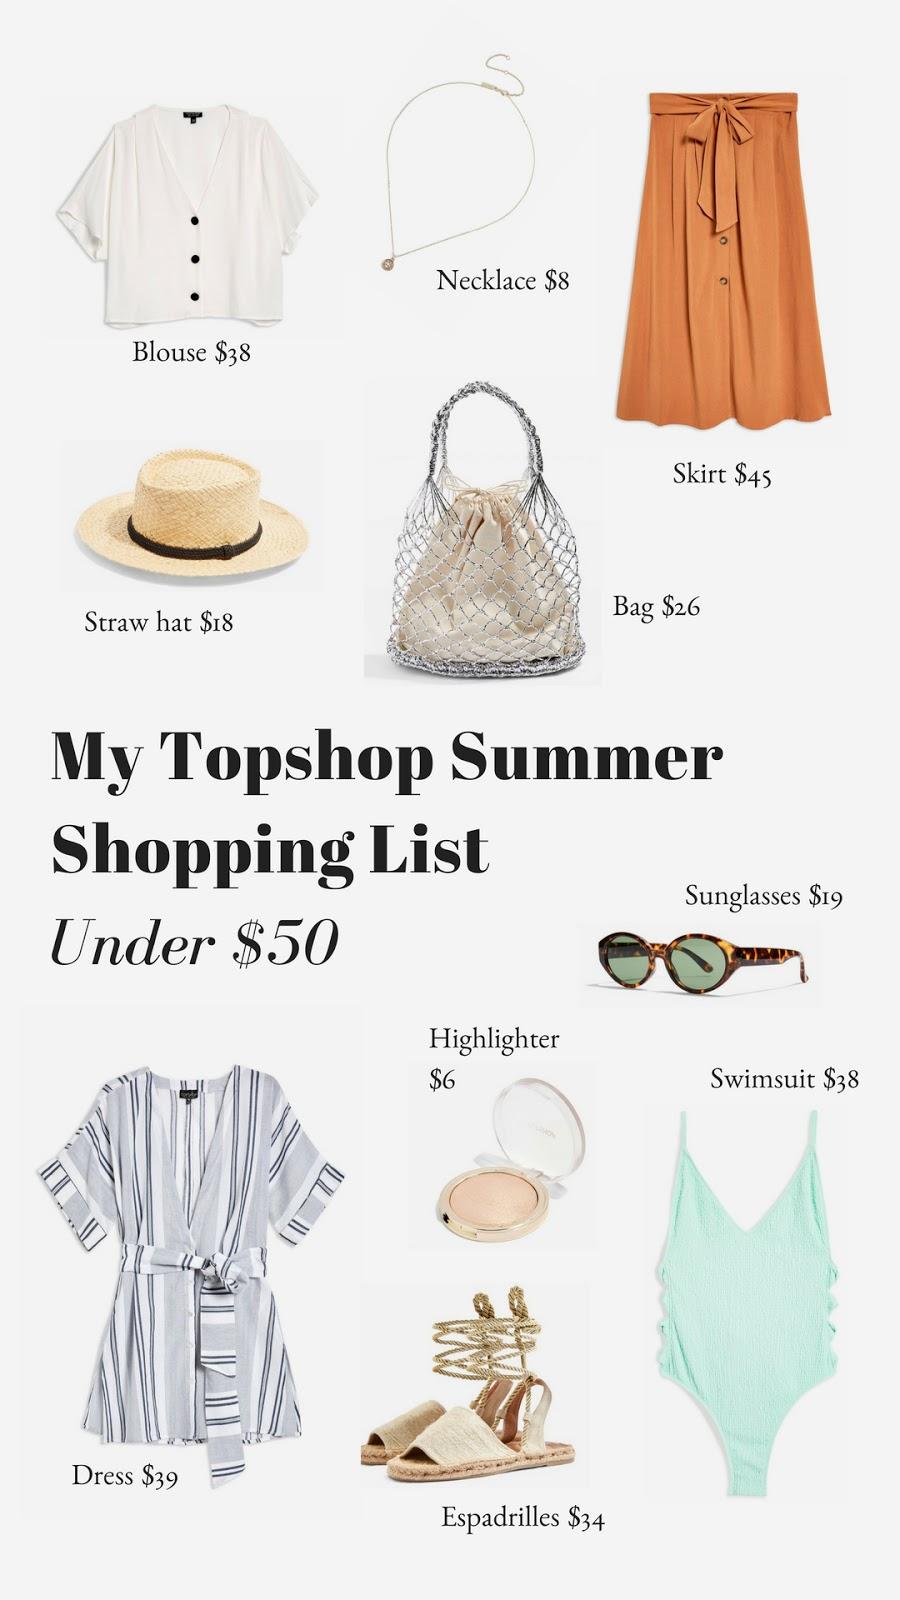 My Topshop Summer Shopping List (Under $50)